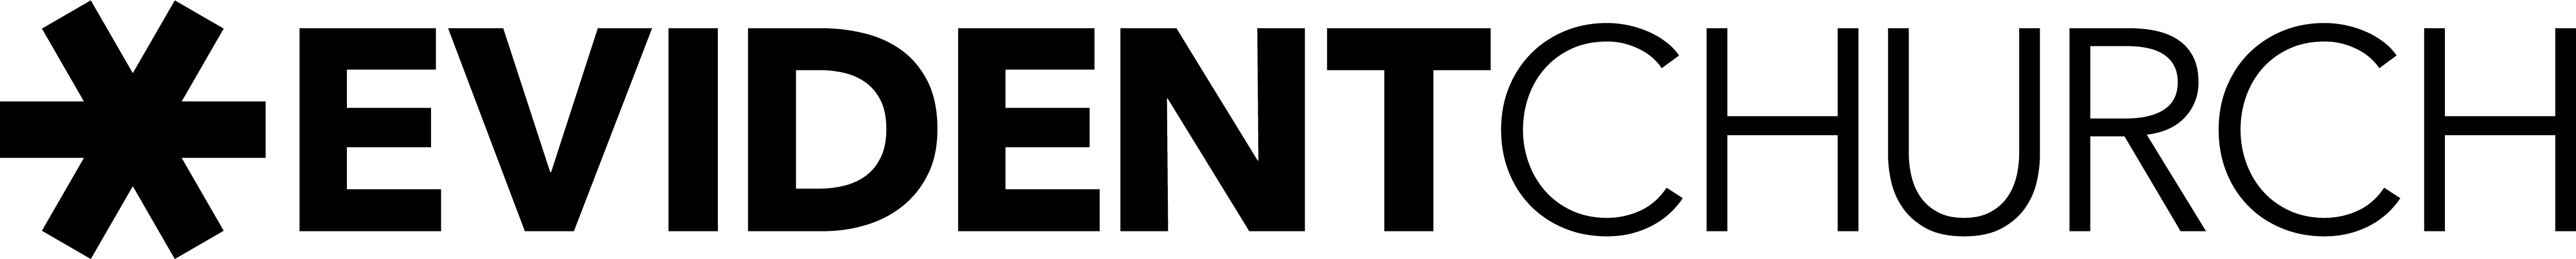 Evident Church Logo